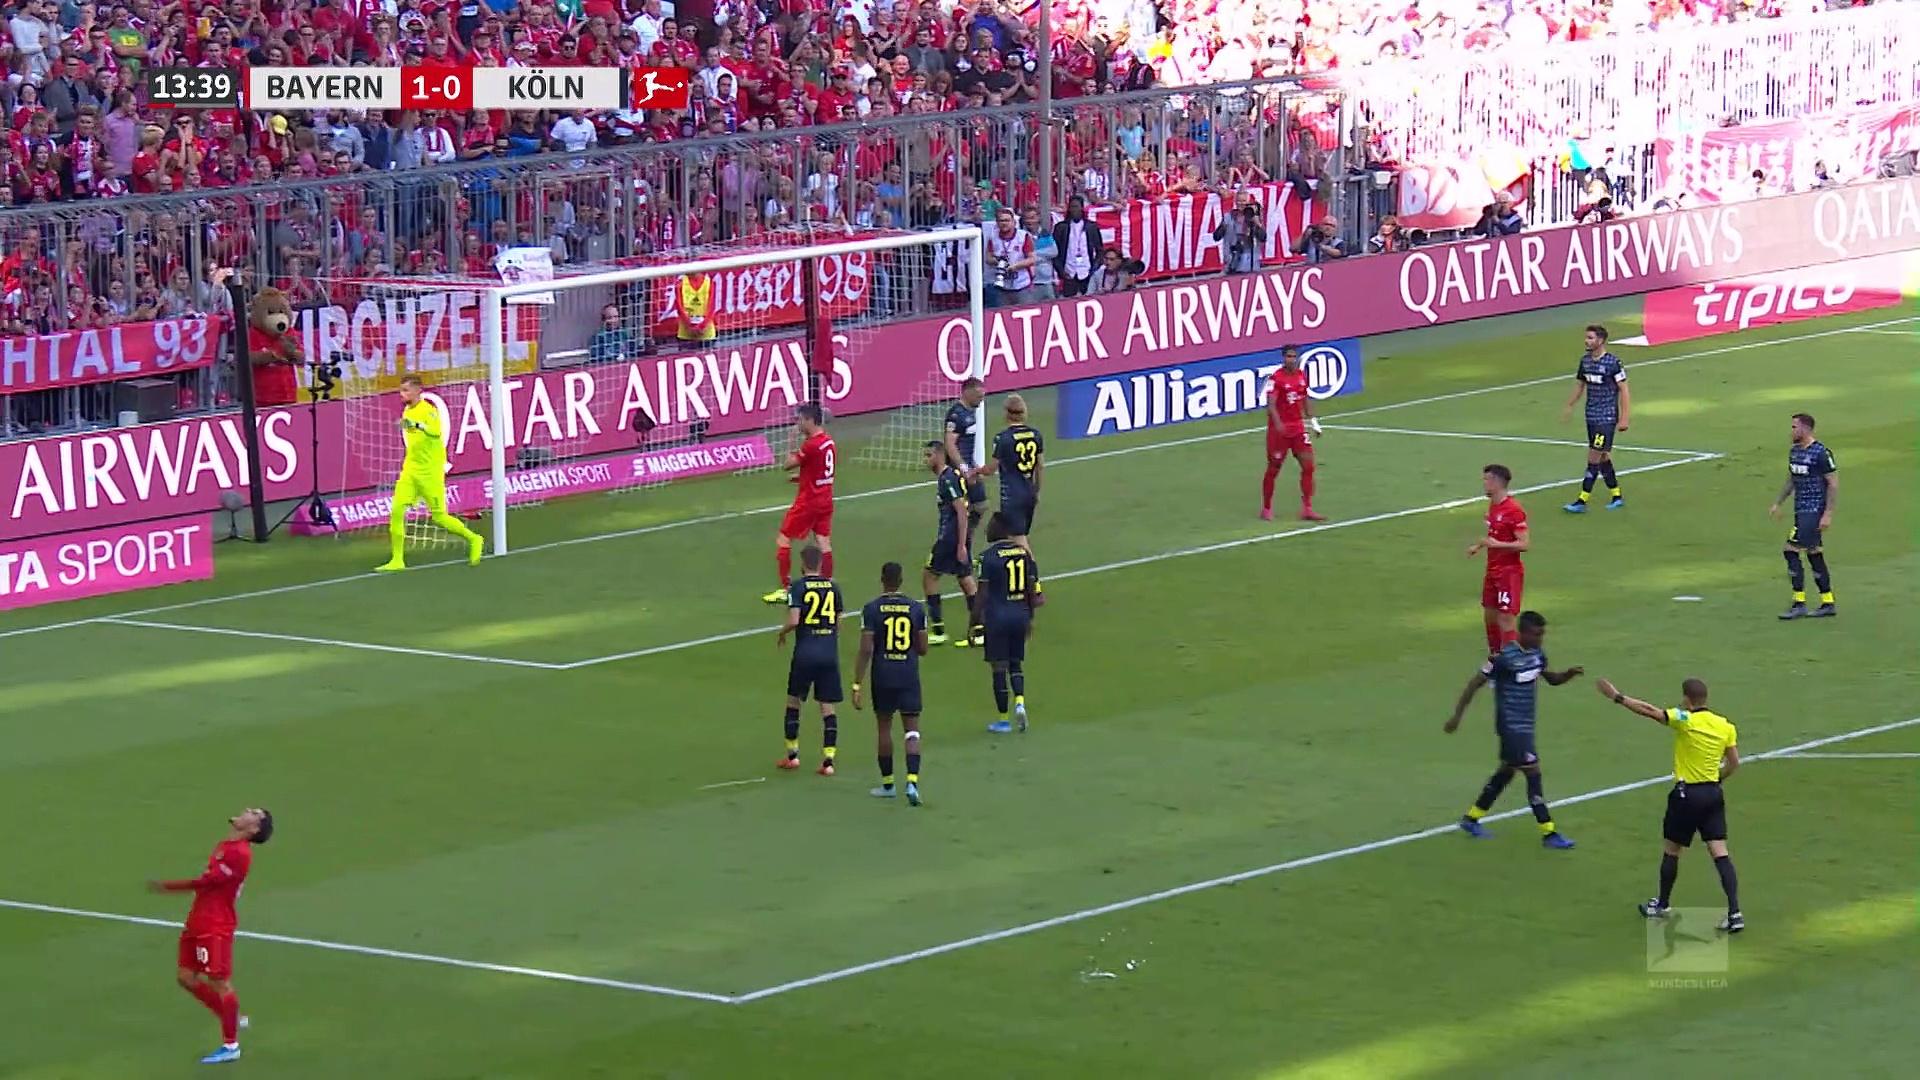 5. Hafta / Bayern Münih - Köln: 4-0 (Özet)